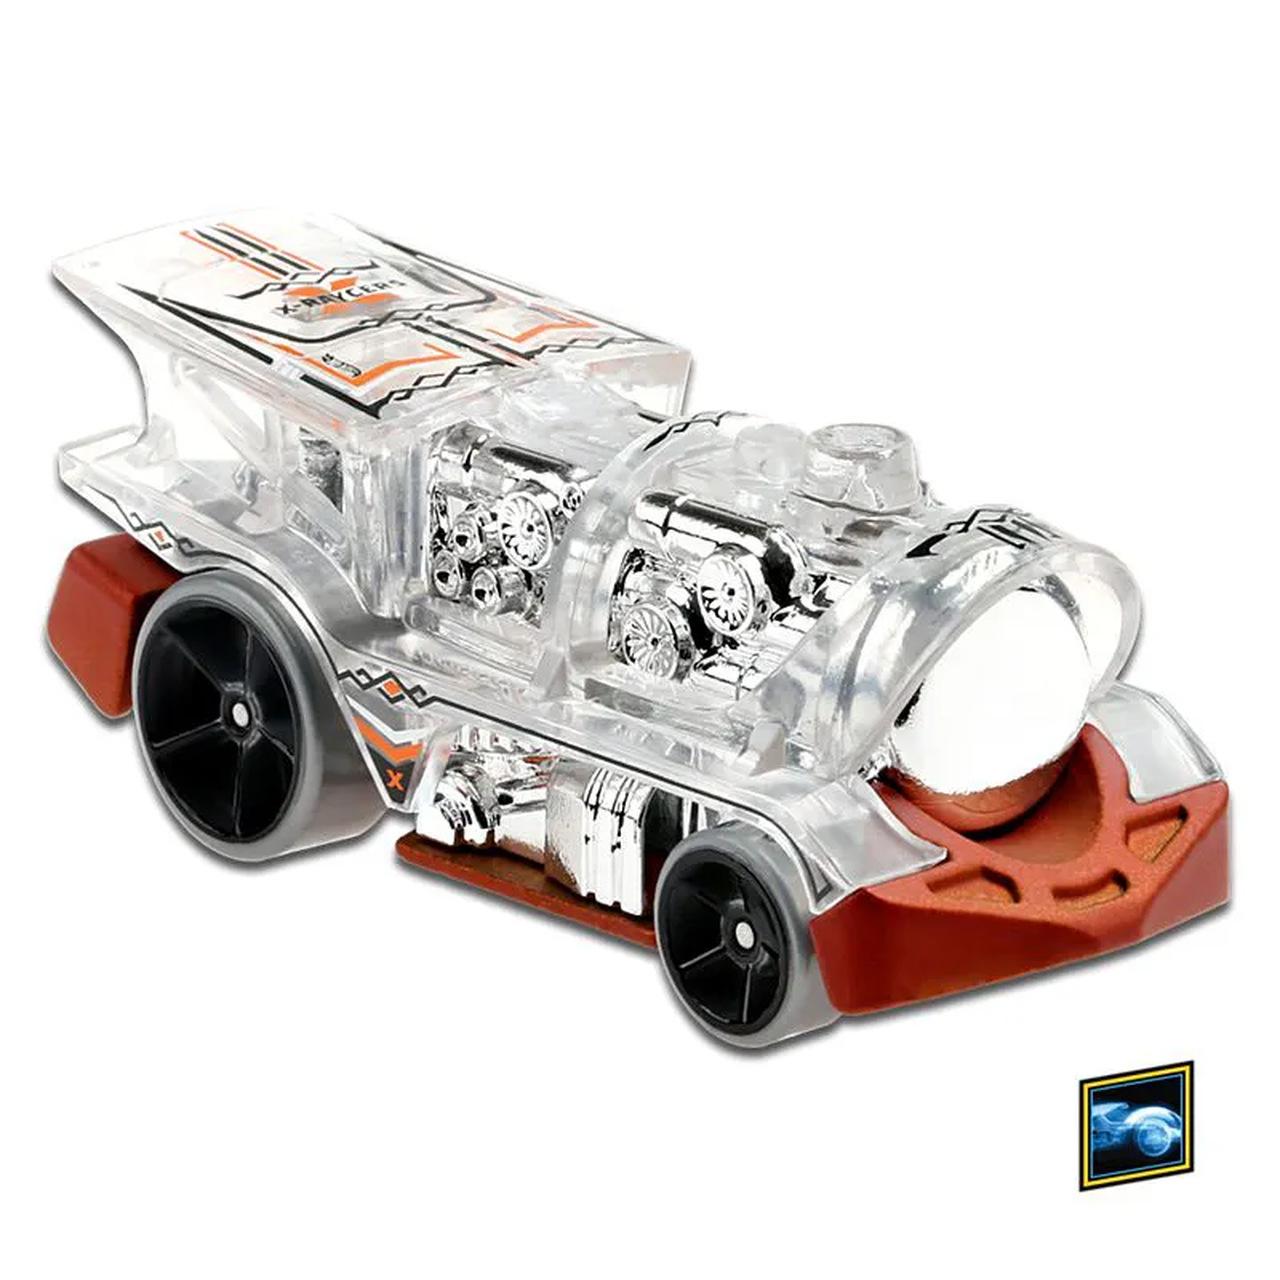 Carrinho Hot Wheels: Loco Motorin X-Raycers - Mattel